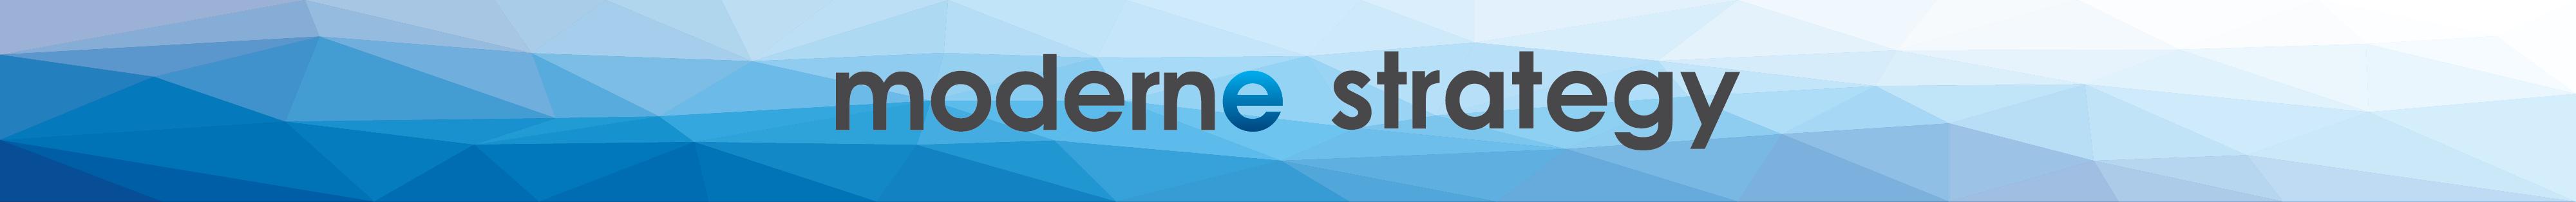 Moderne Strategy Banner Final Edit.png